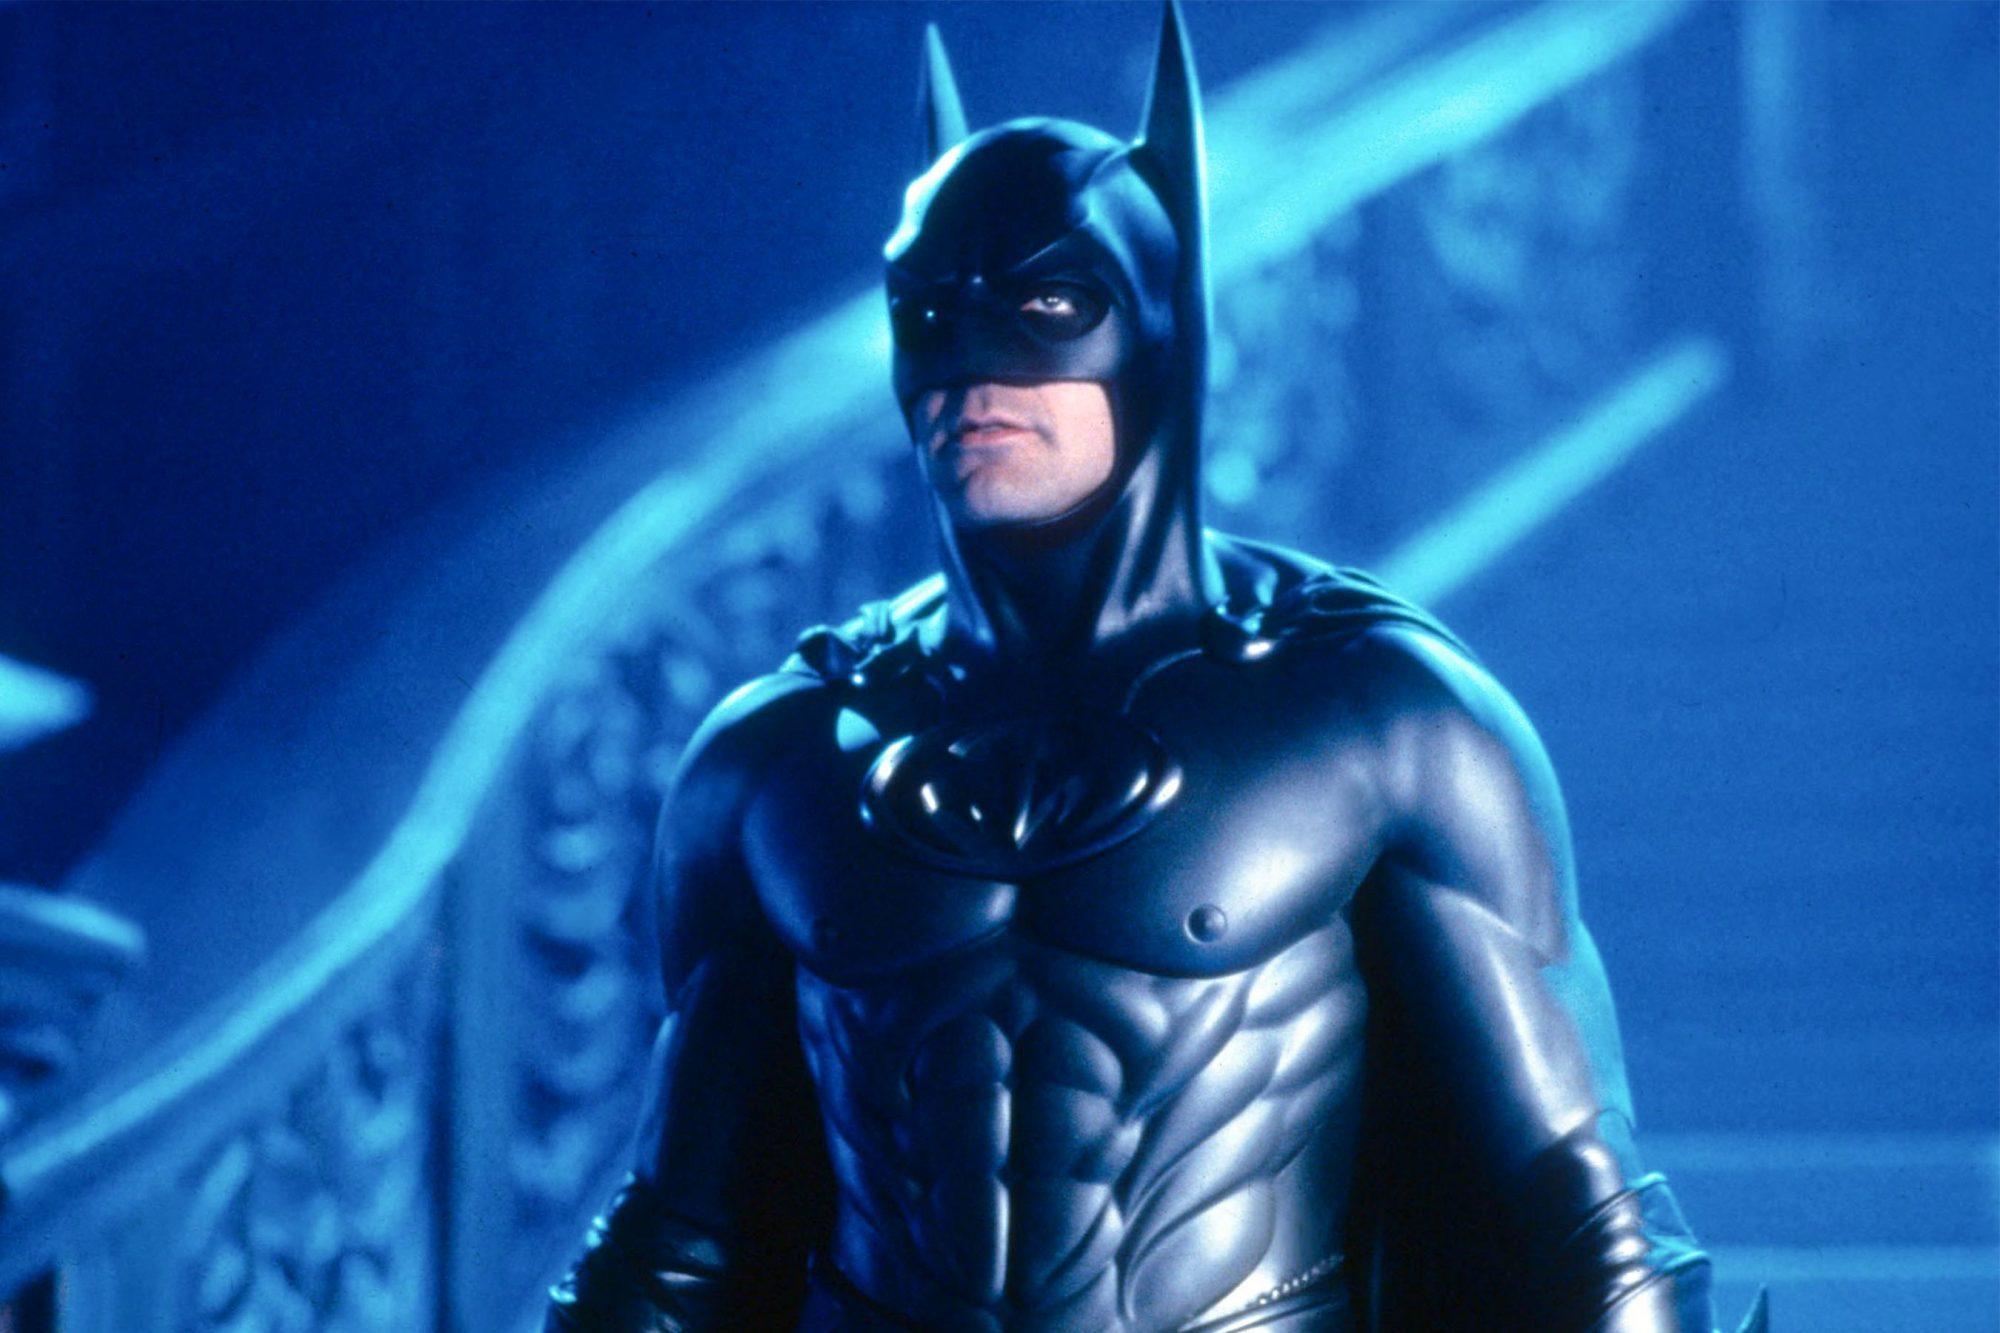 BATMAN and ROBIN US / BR 1997 aka BATMAN AND ROBIN GEORGE CLOONEY as Bruce Wayne / Batman BATMAN ROBIN US / BR 1997 aka BATMAN AND ROBIN GEORGE CLOONEY as Bruce Wayne / Batman Date 1997, Photo by: Mary Evans/WARNER BROS/Ronald Grant/Everett Collection(10396635)